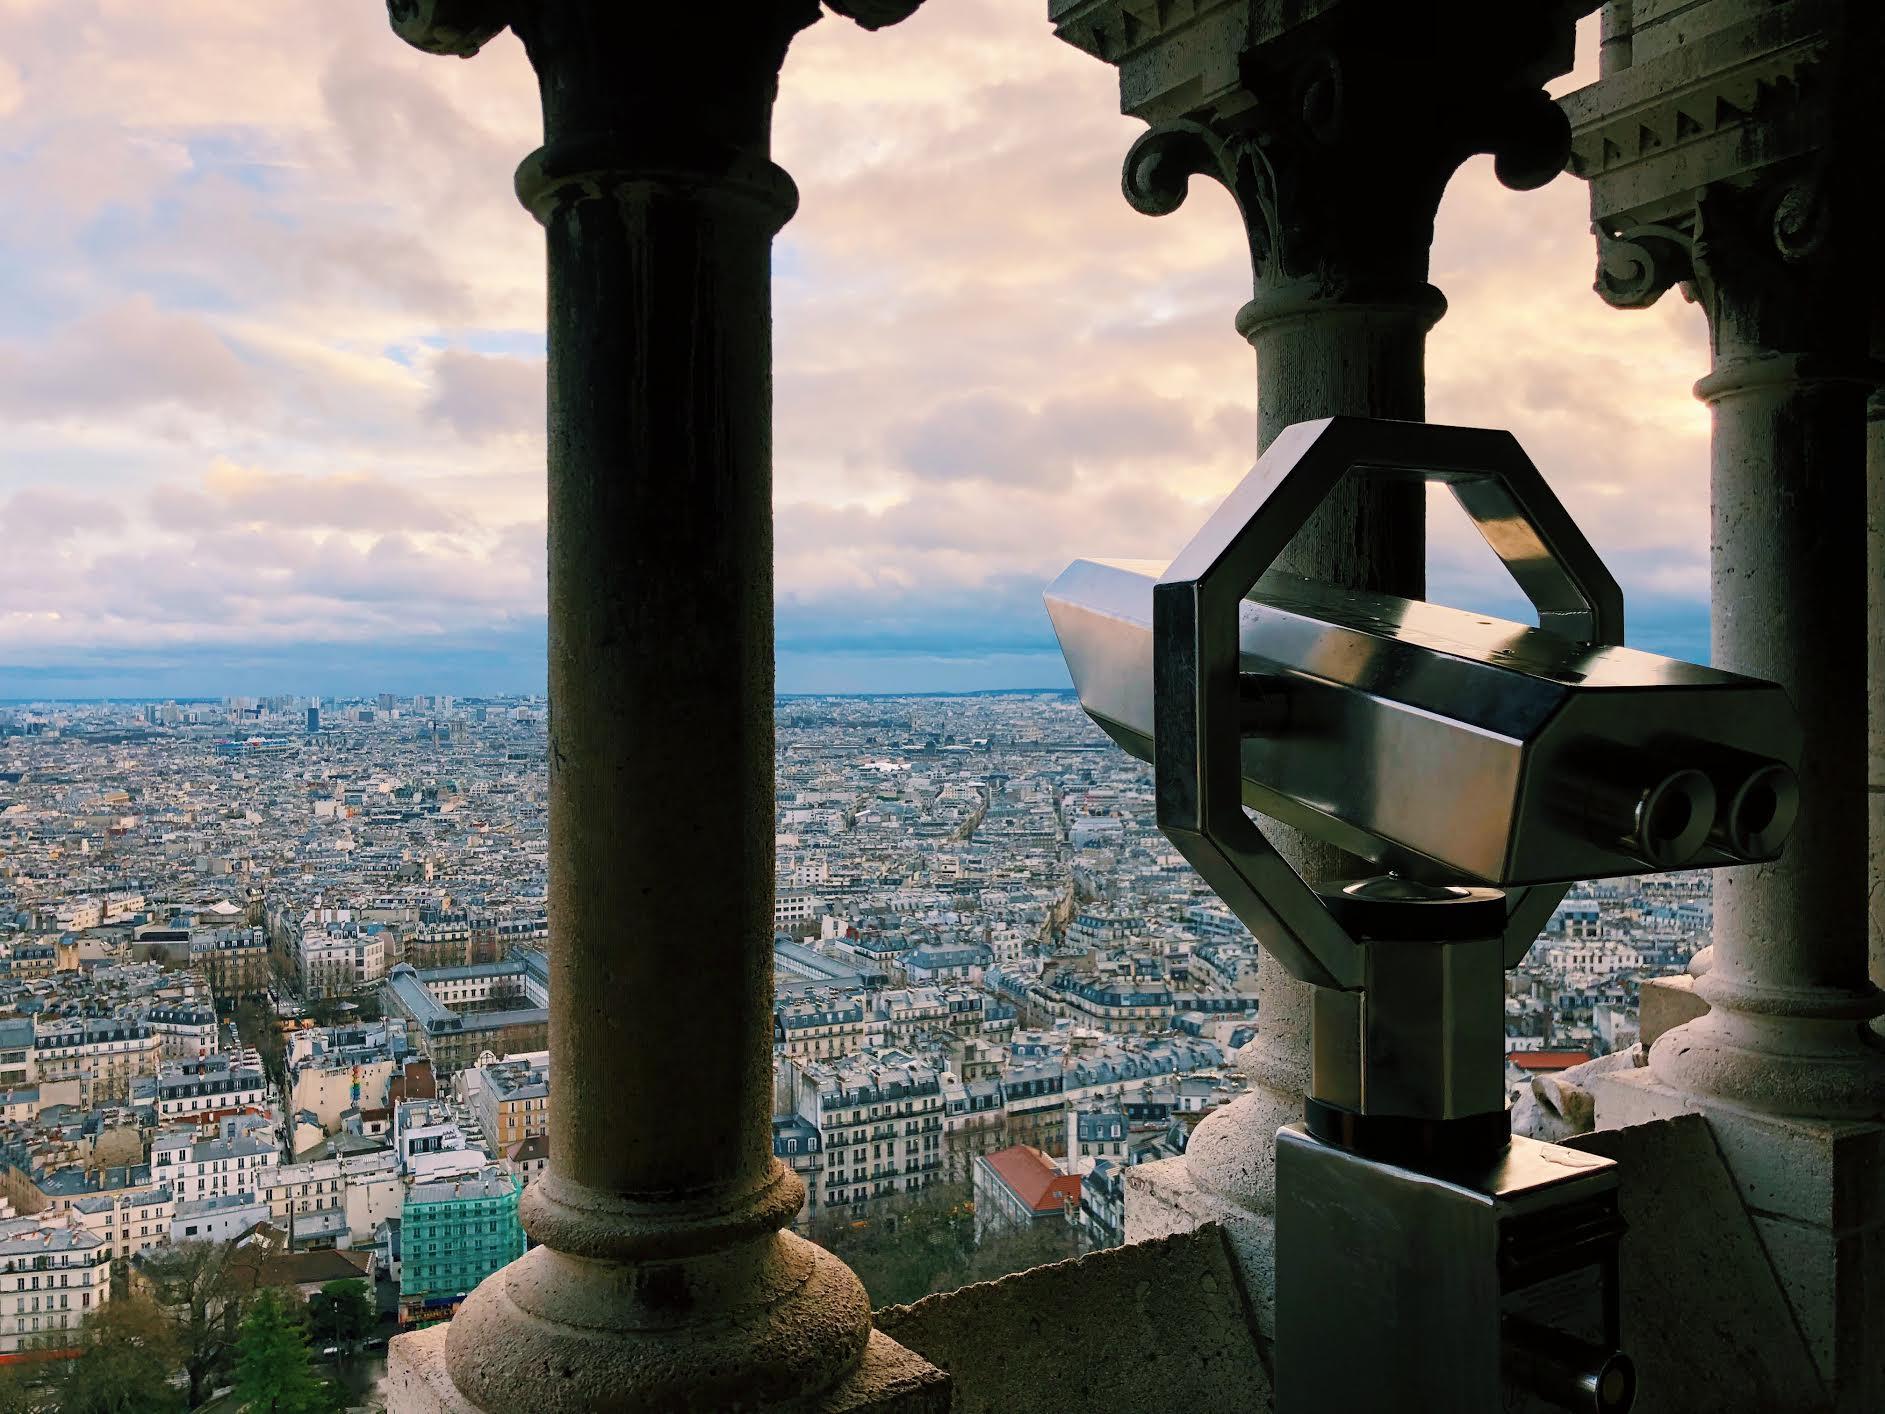 Muslim-travel-guide-Paris-sunset-view-Sacre-Coeur-church.jpg